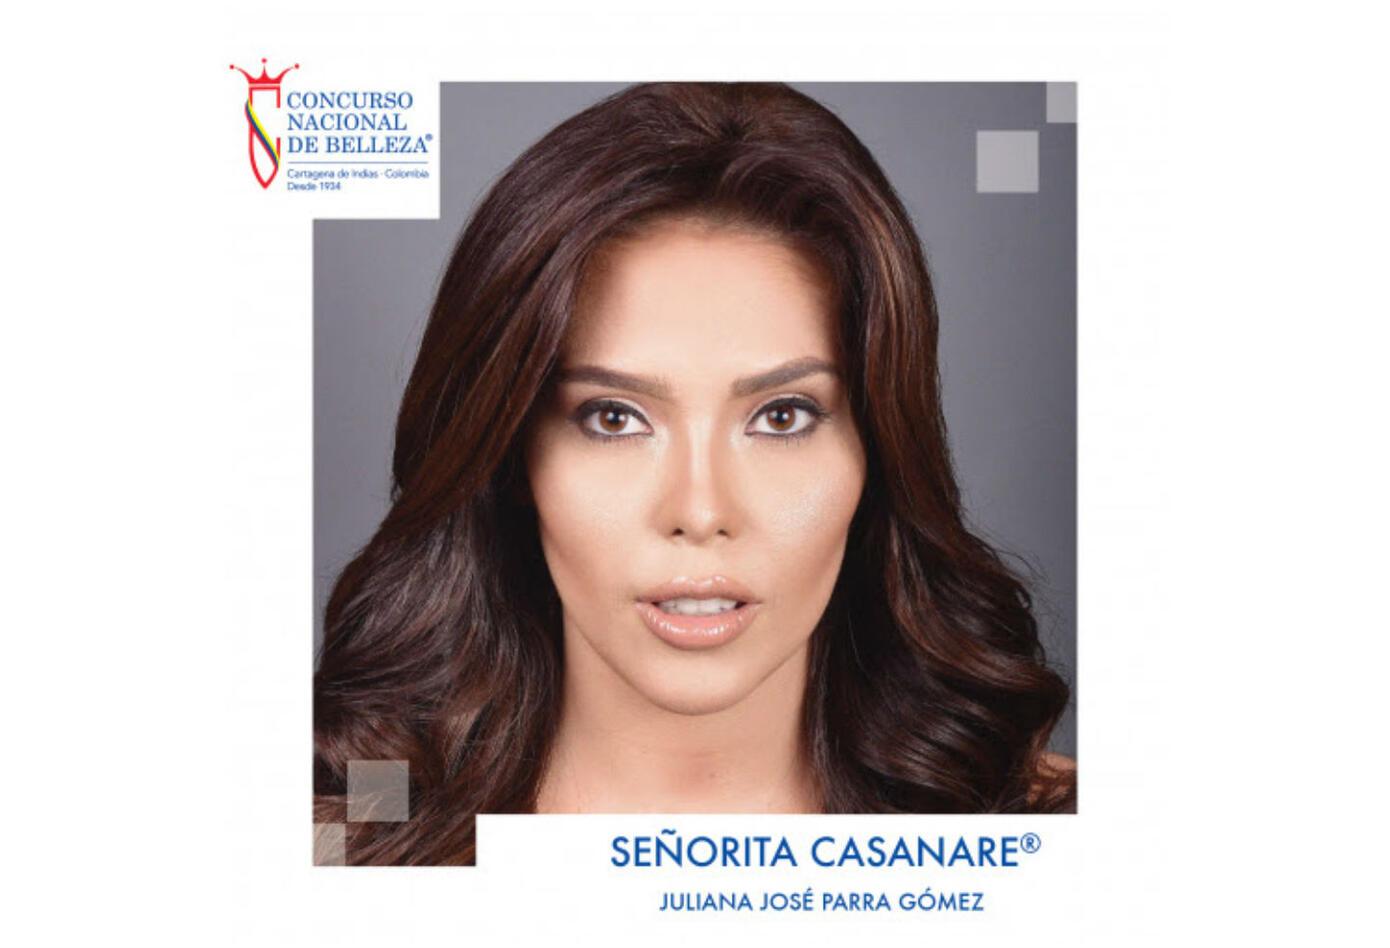 Juliana José Parra, señorita Casanare 2019